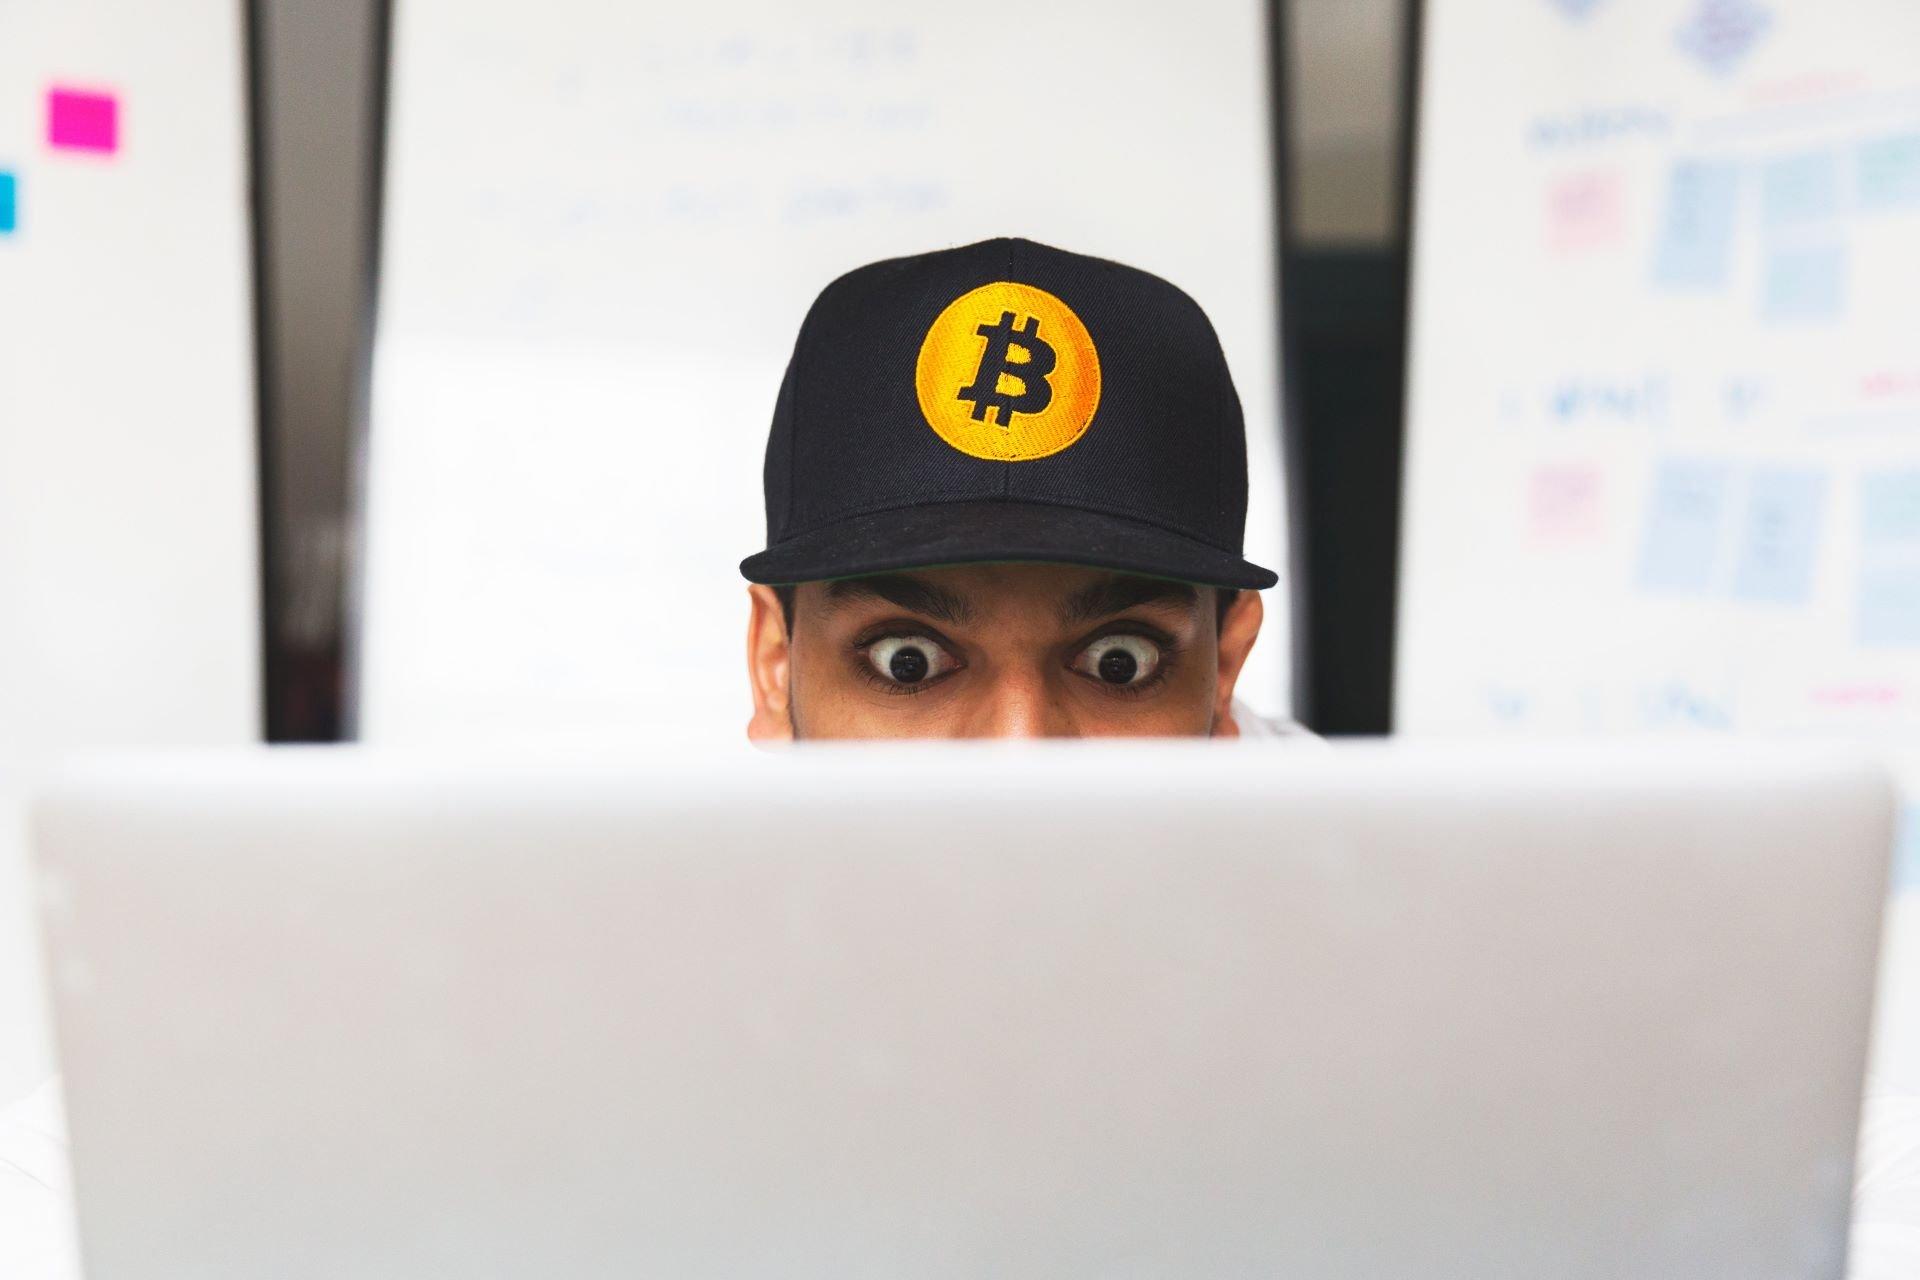 gemini-launching-cryptocurrency-bitcoin-credit-card